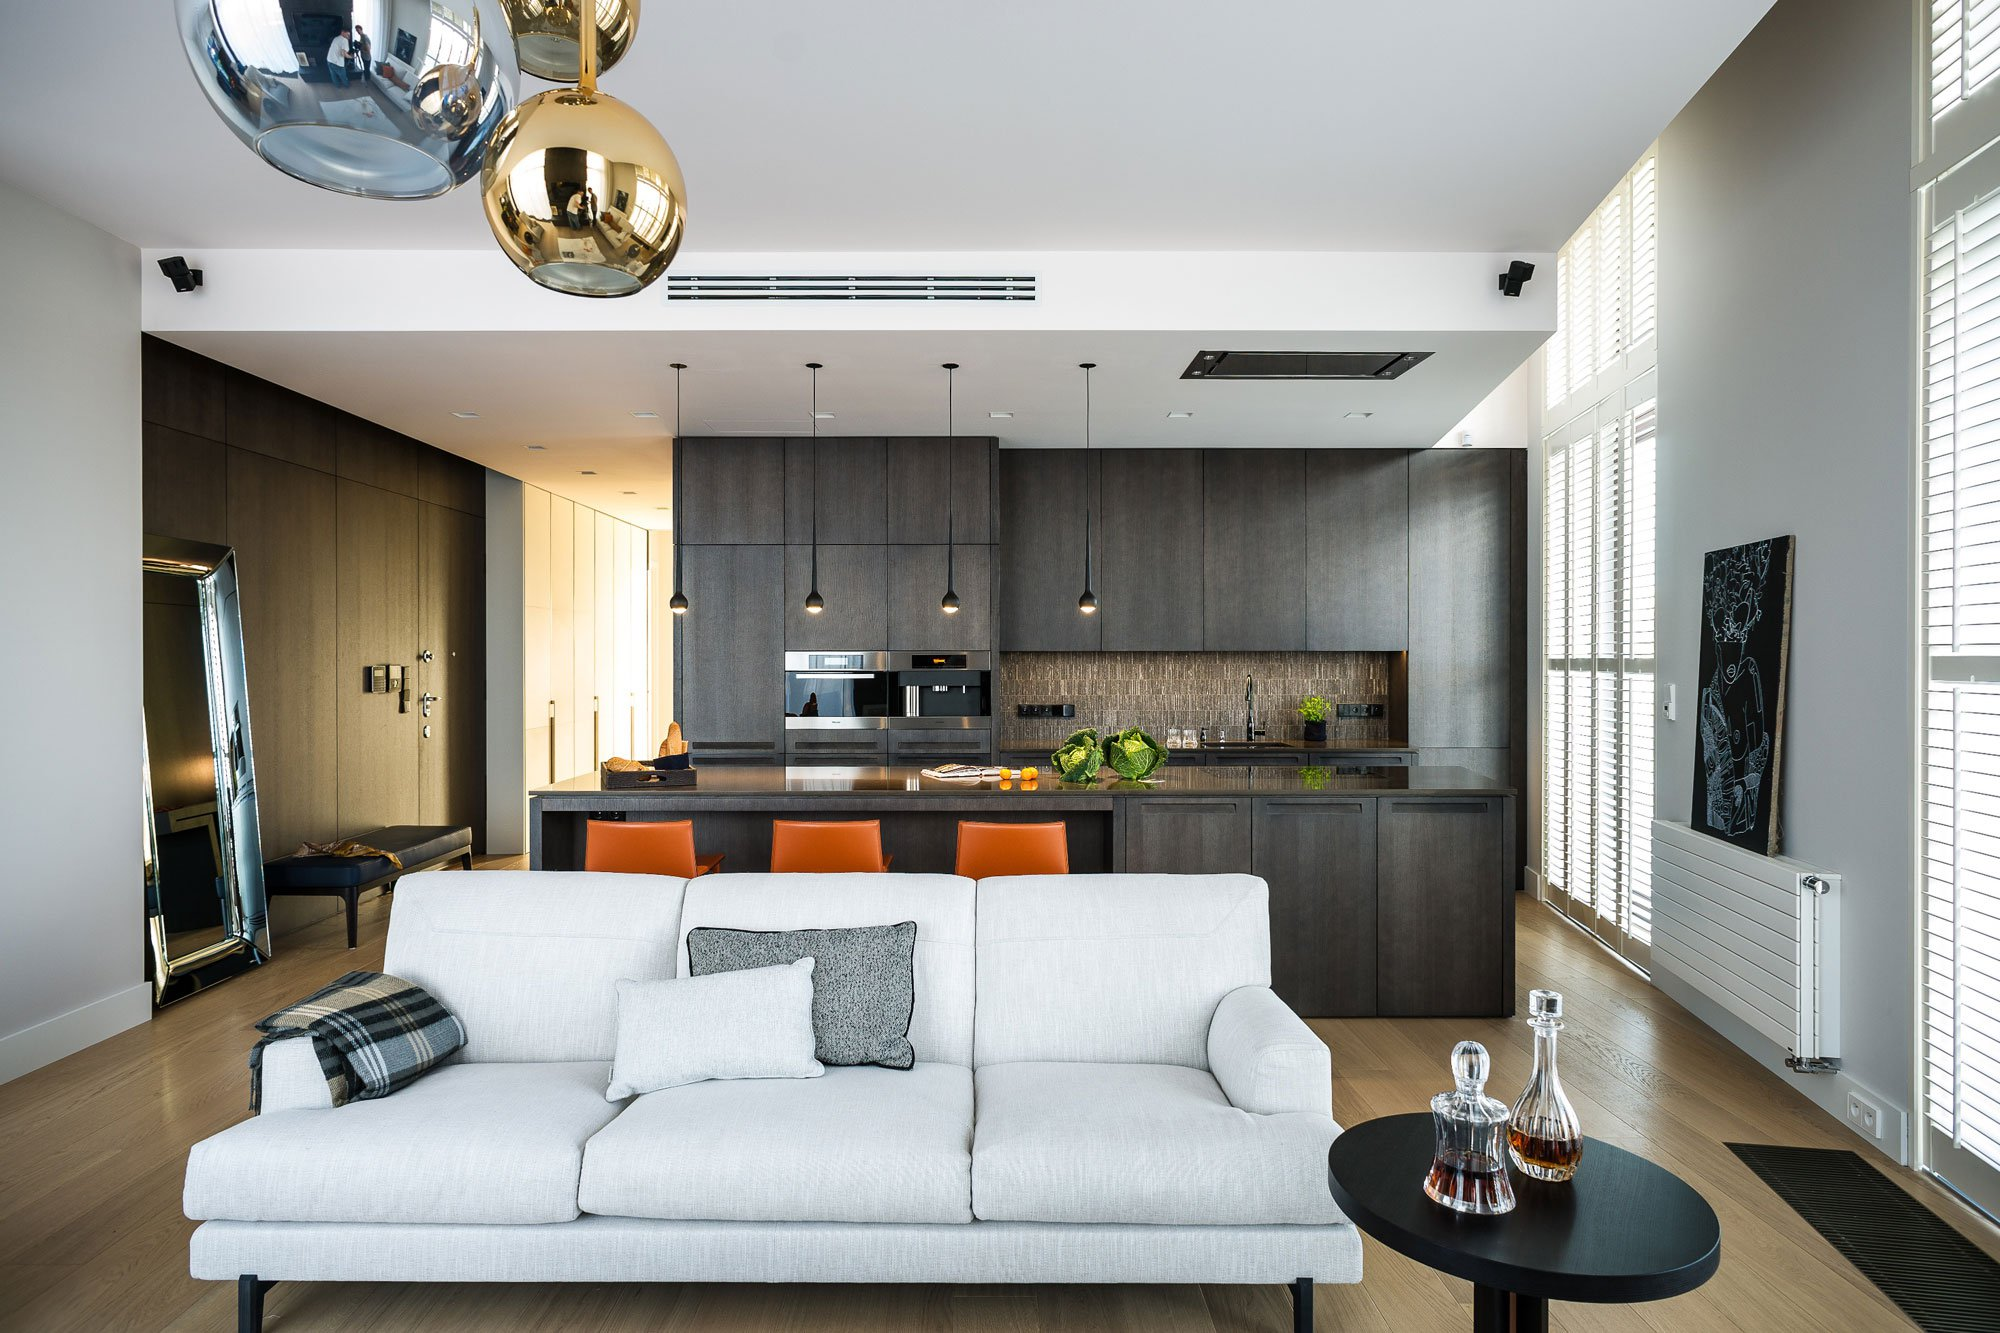 Apartment-in-Nowe-Powisle-02